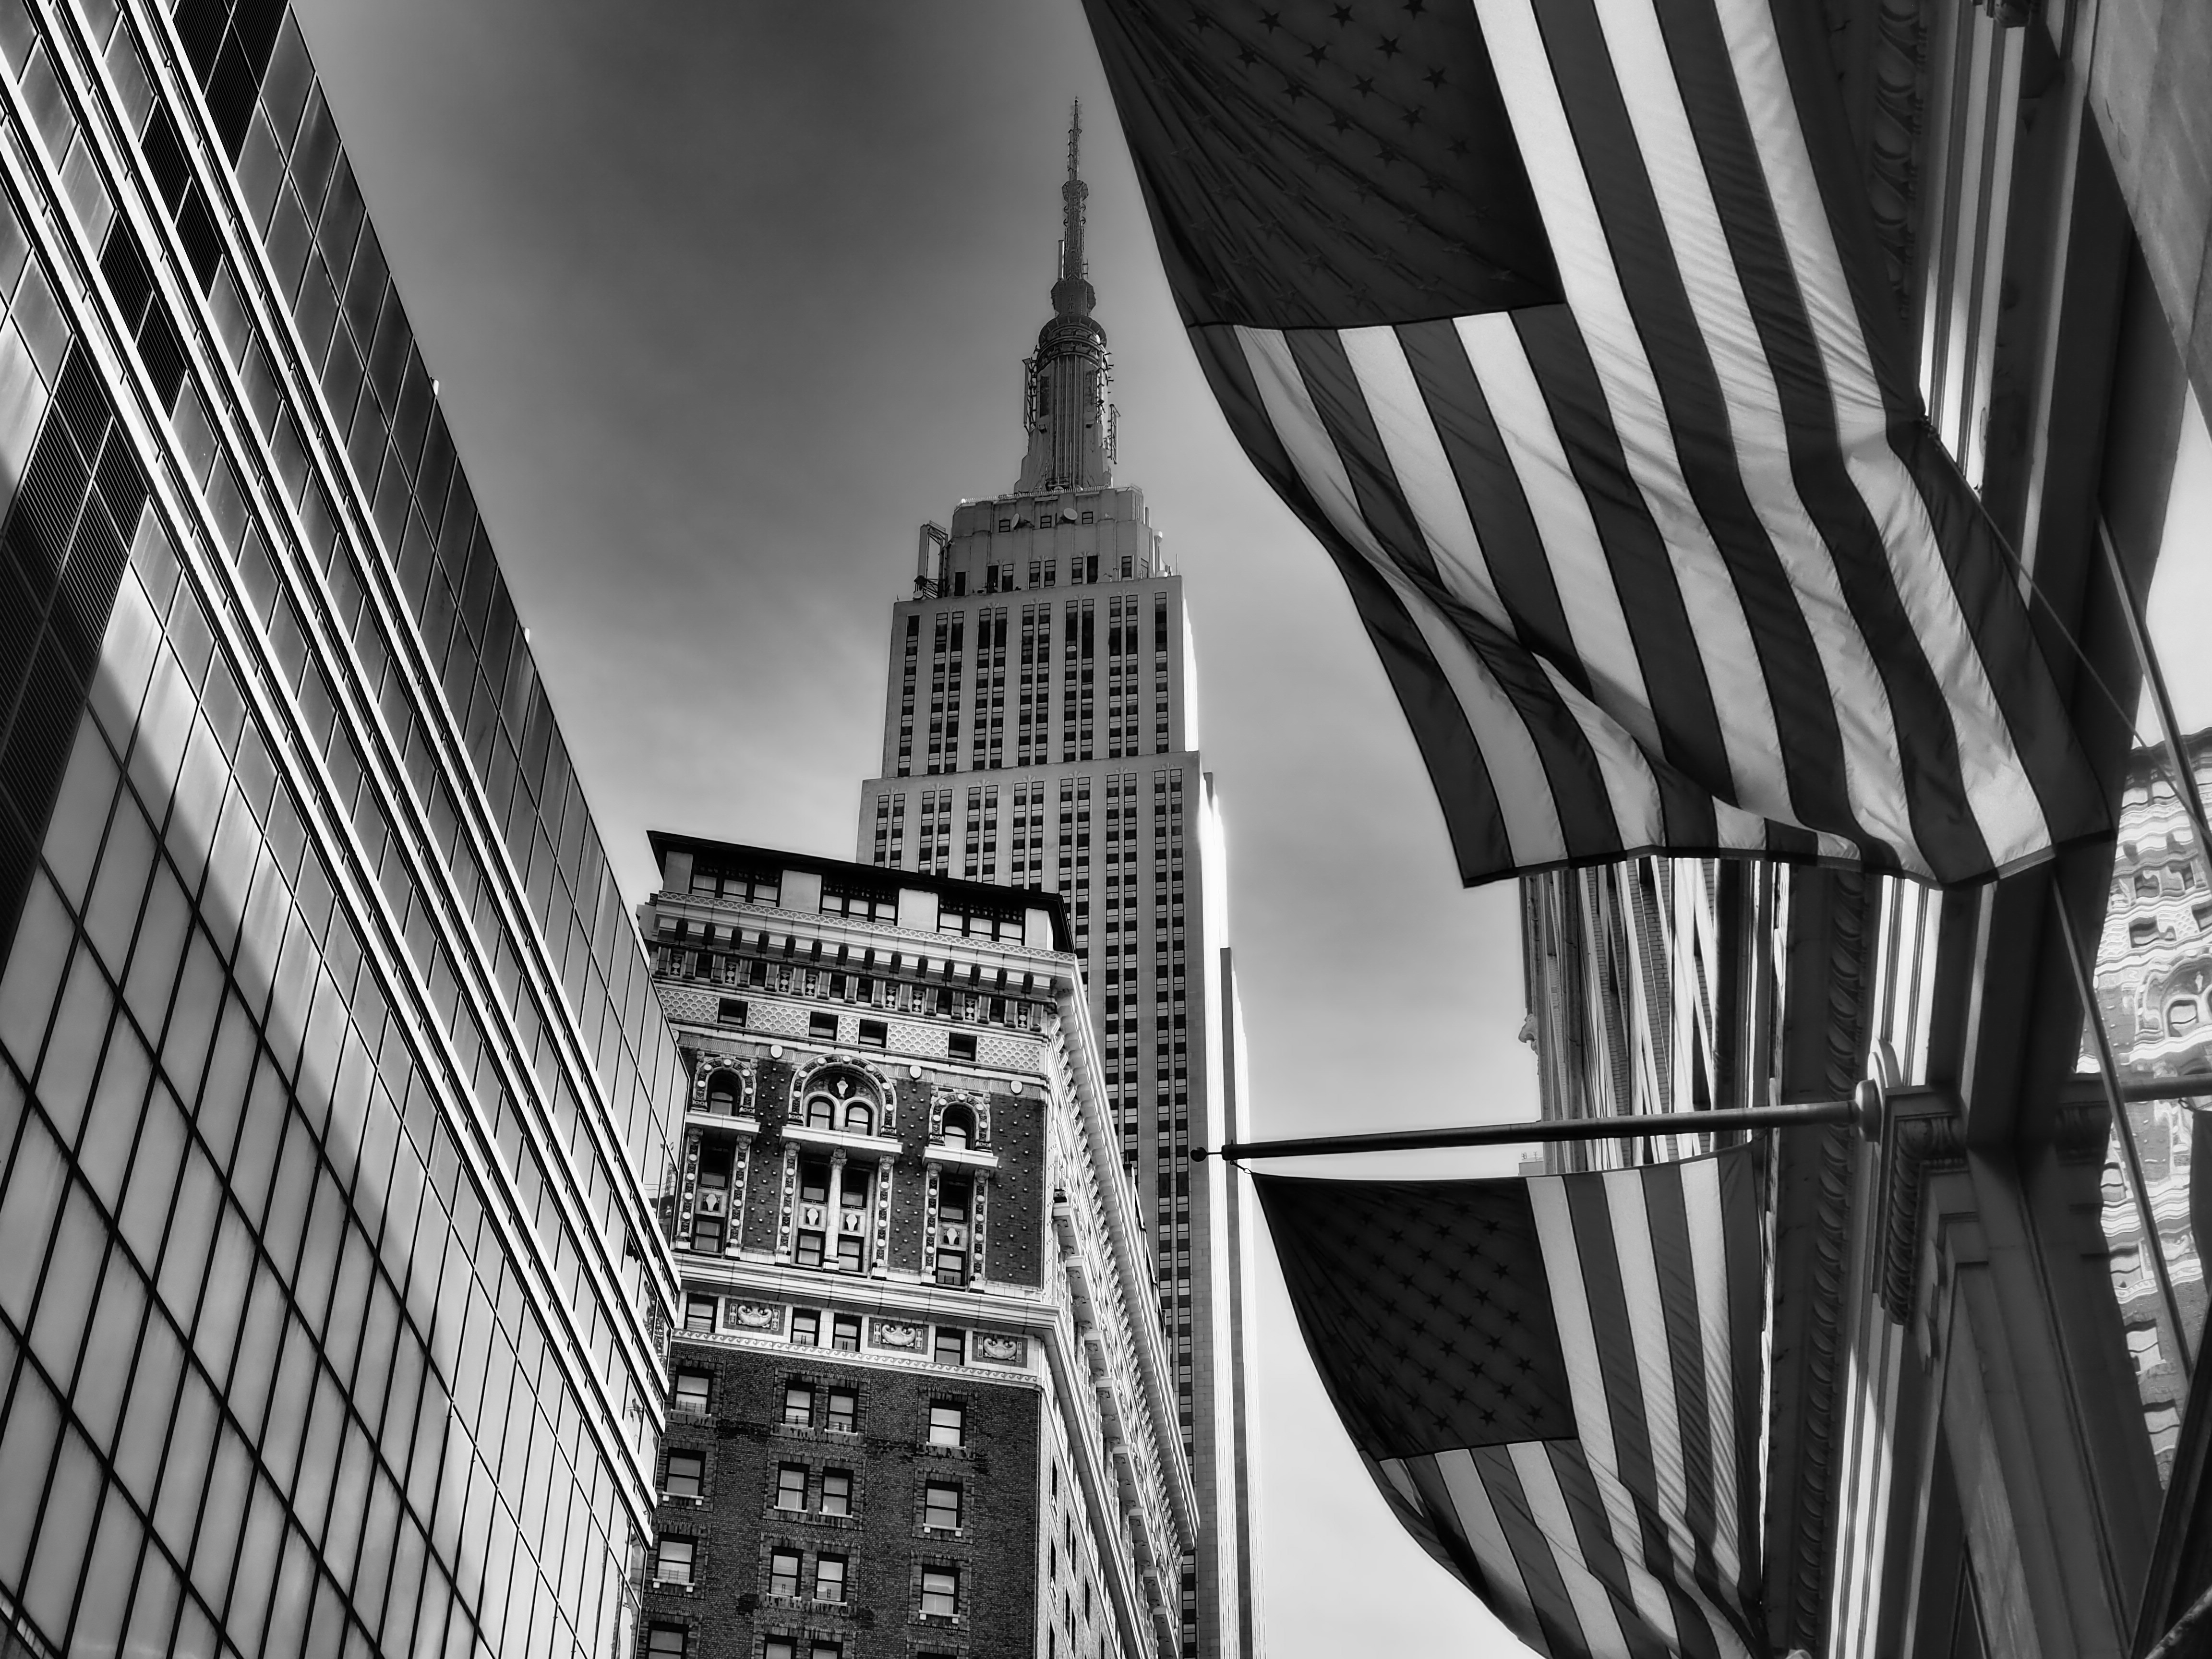 Credit: Dorothea Mursch-Edlmayr, NY